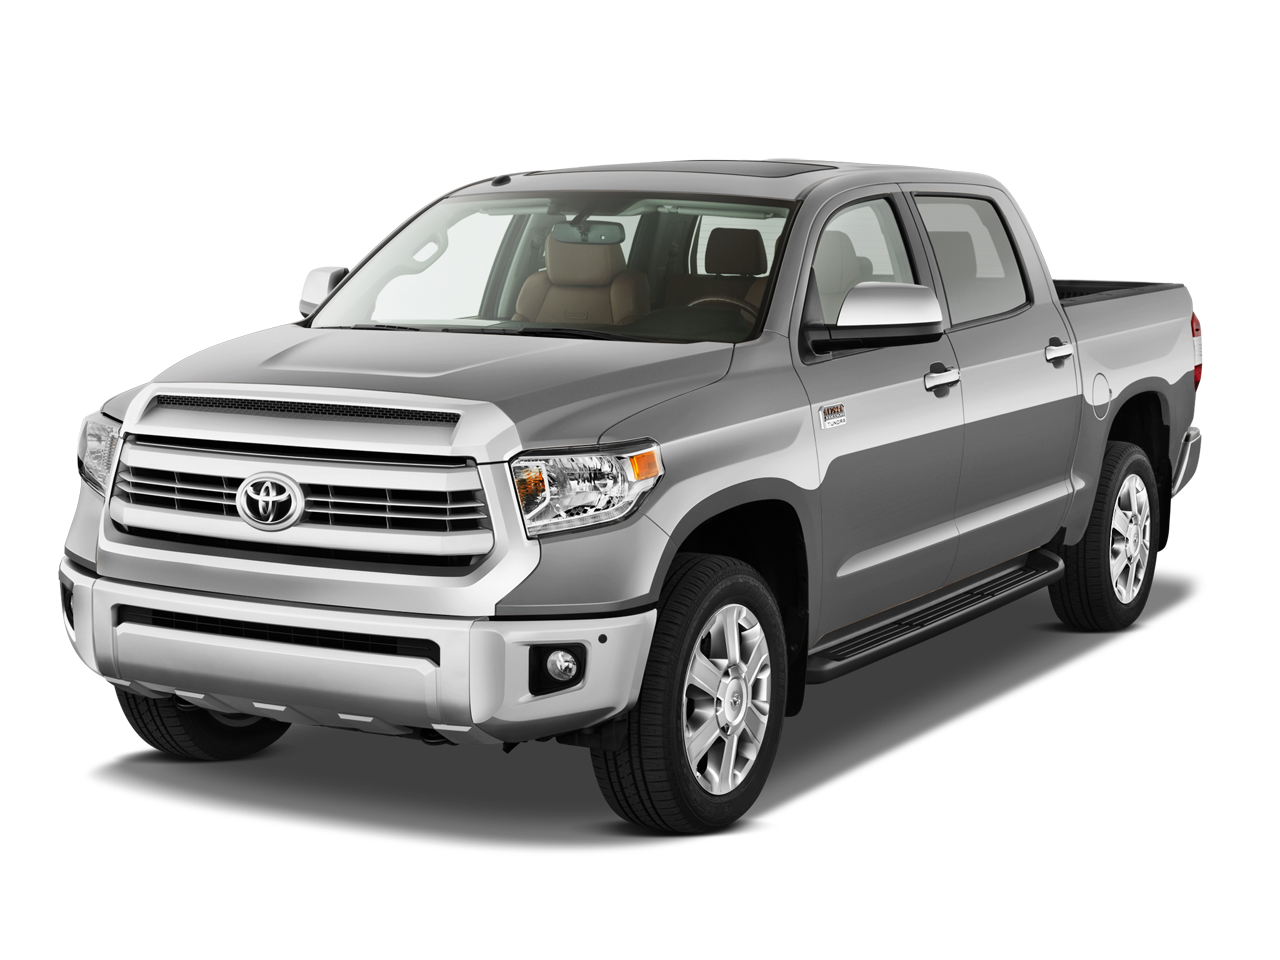 Toyota Financial Statement Toyota Dealer Incentives Cornhusker Toyota